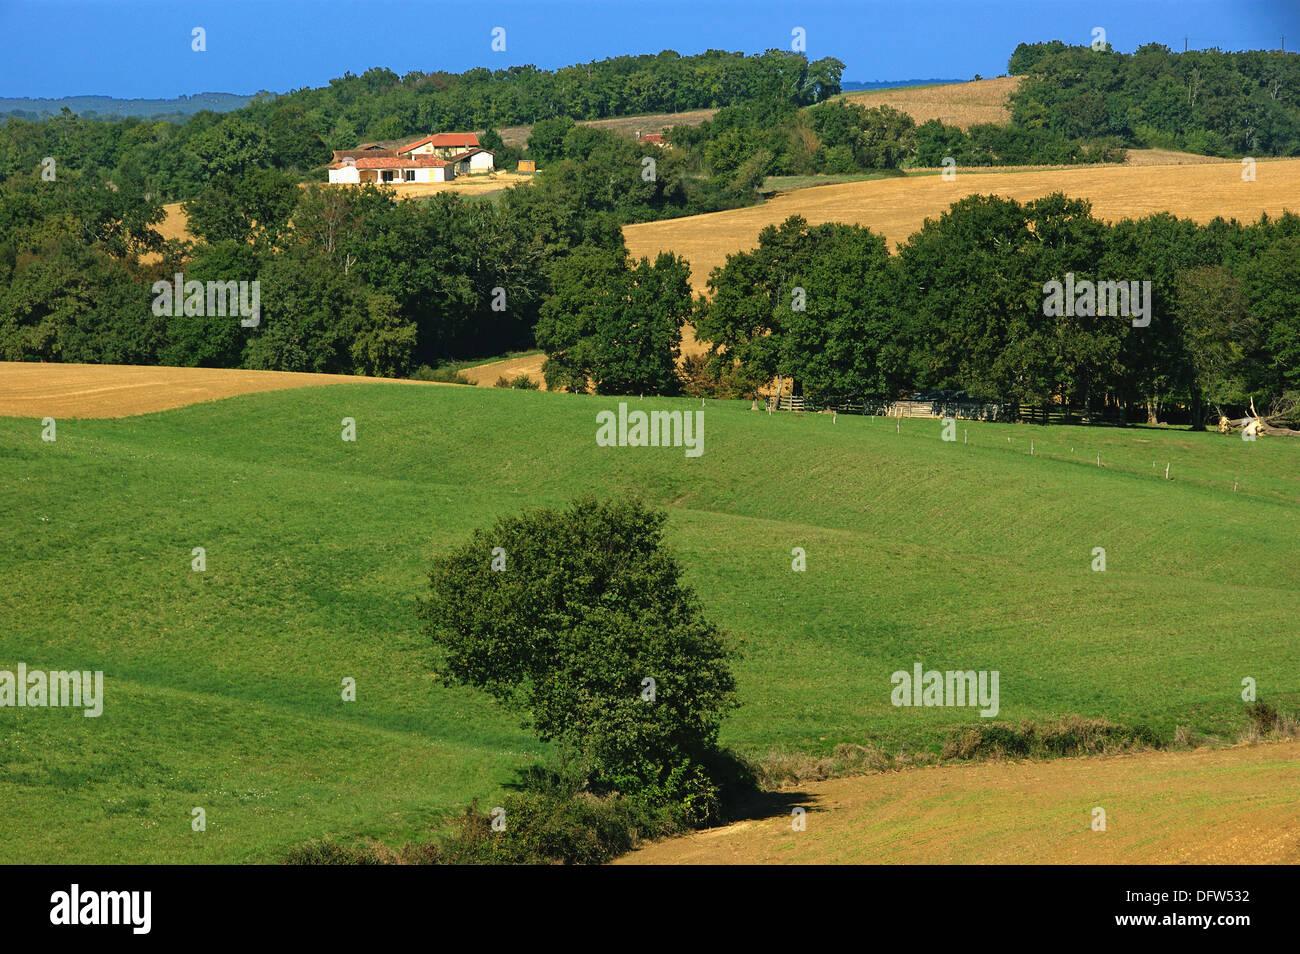 Landscape near Vic-Fezensac, Gers, Midi-Pyrenees, France - Stock Image